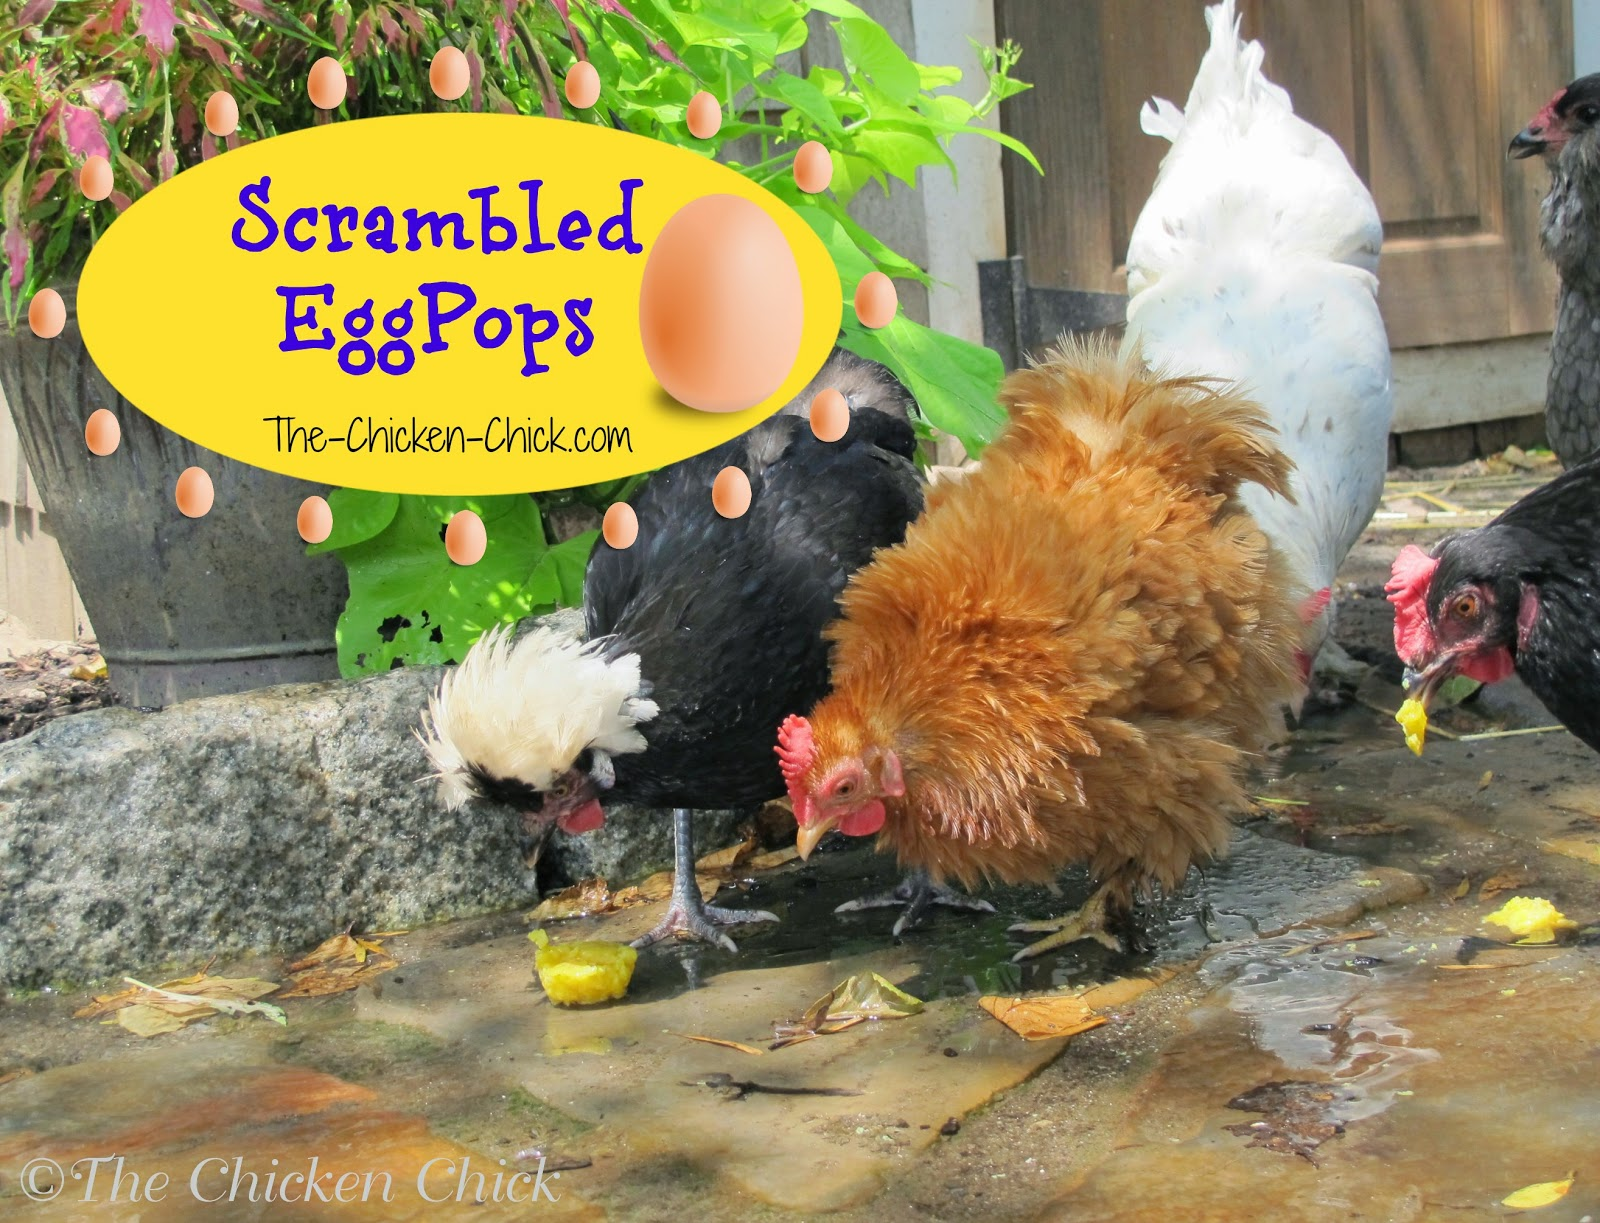 Scrambled EggPops recipe